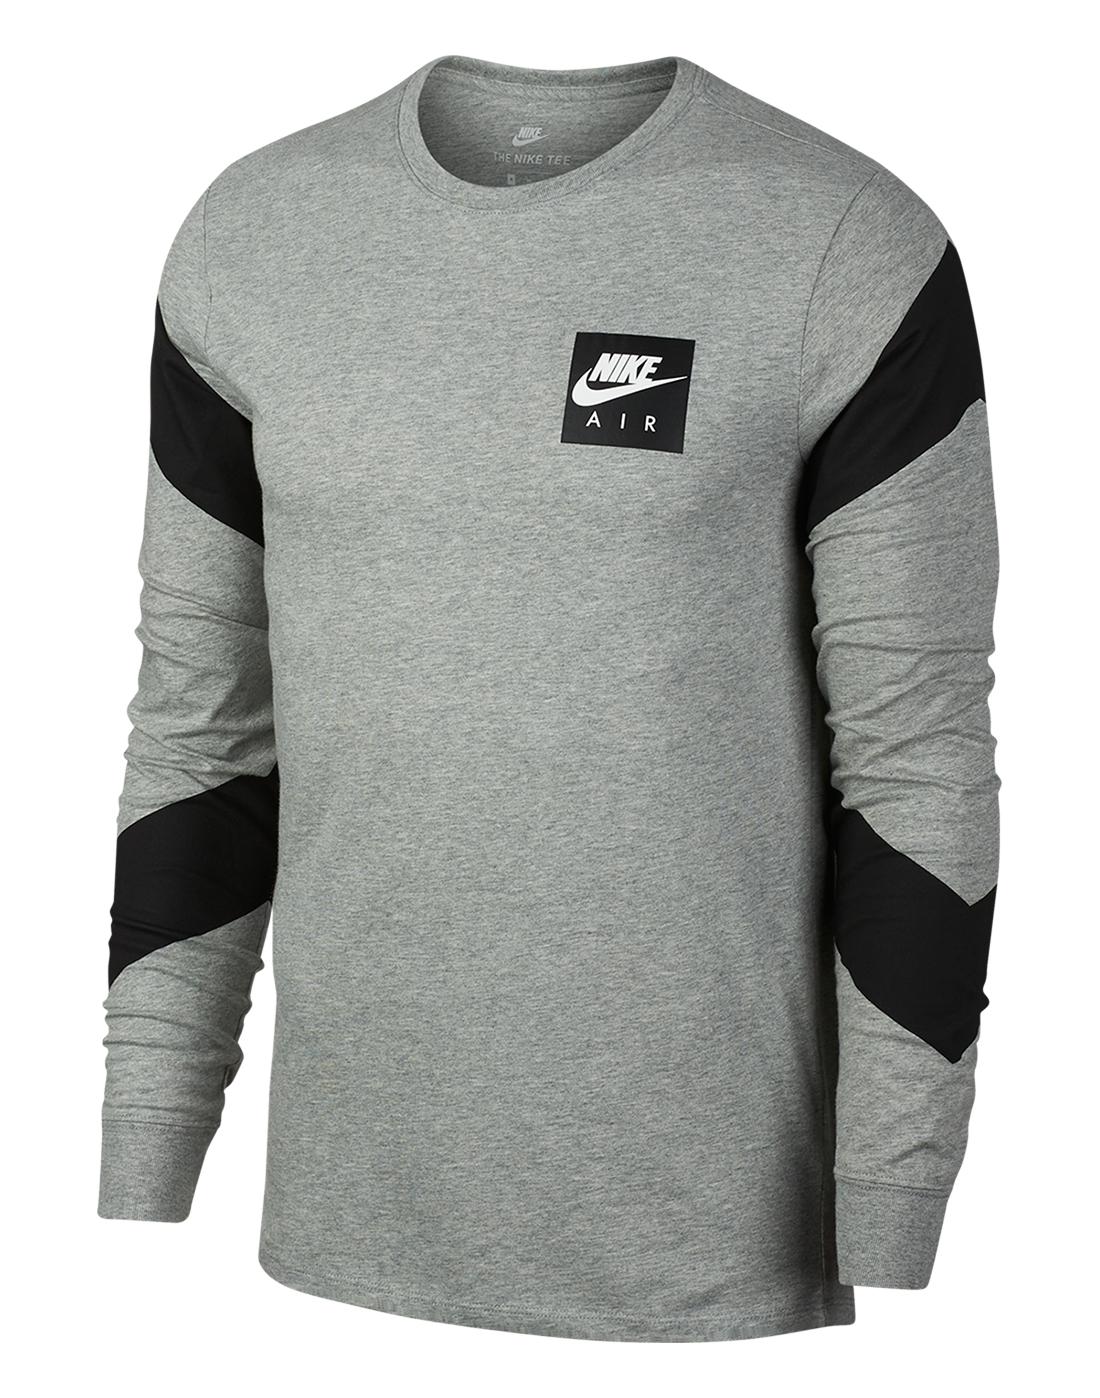 90605460 Men's Grey Nike Air Long Sleeve T-Shirt | Life Style Sports